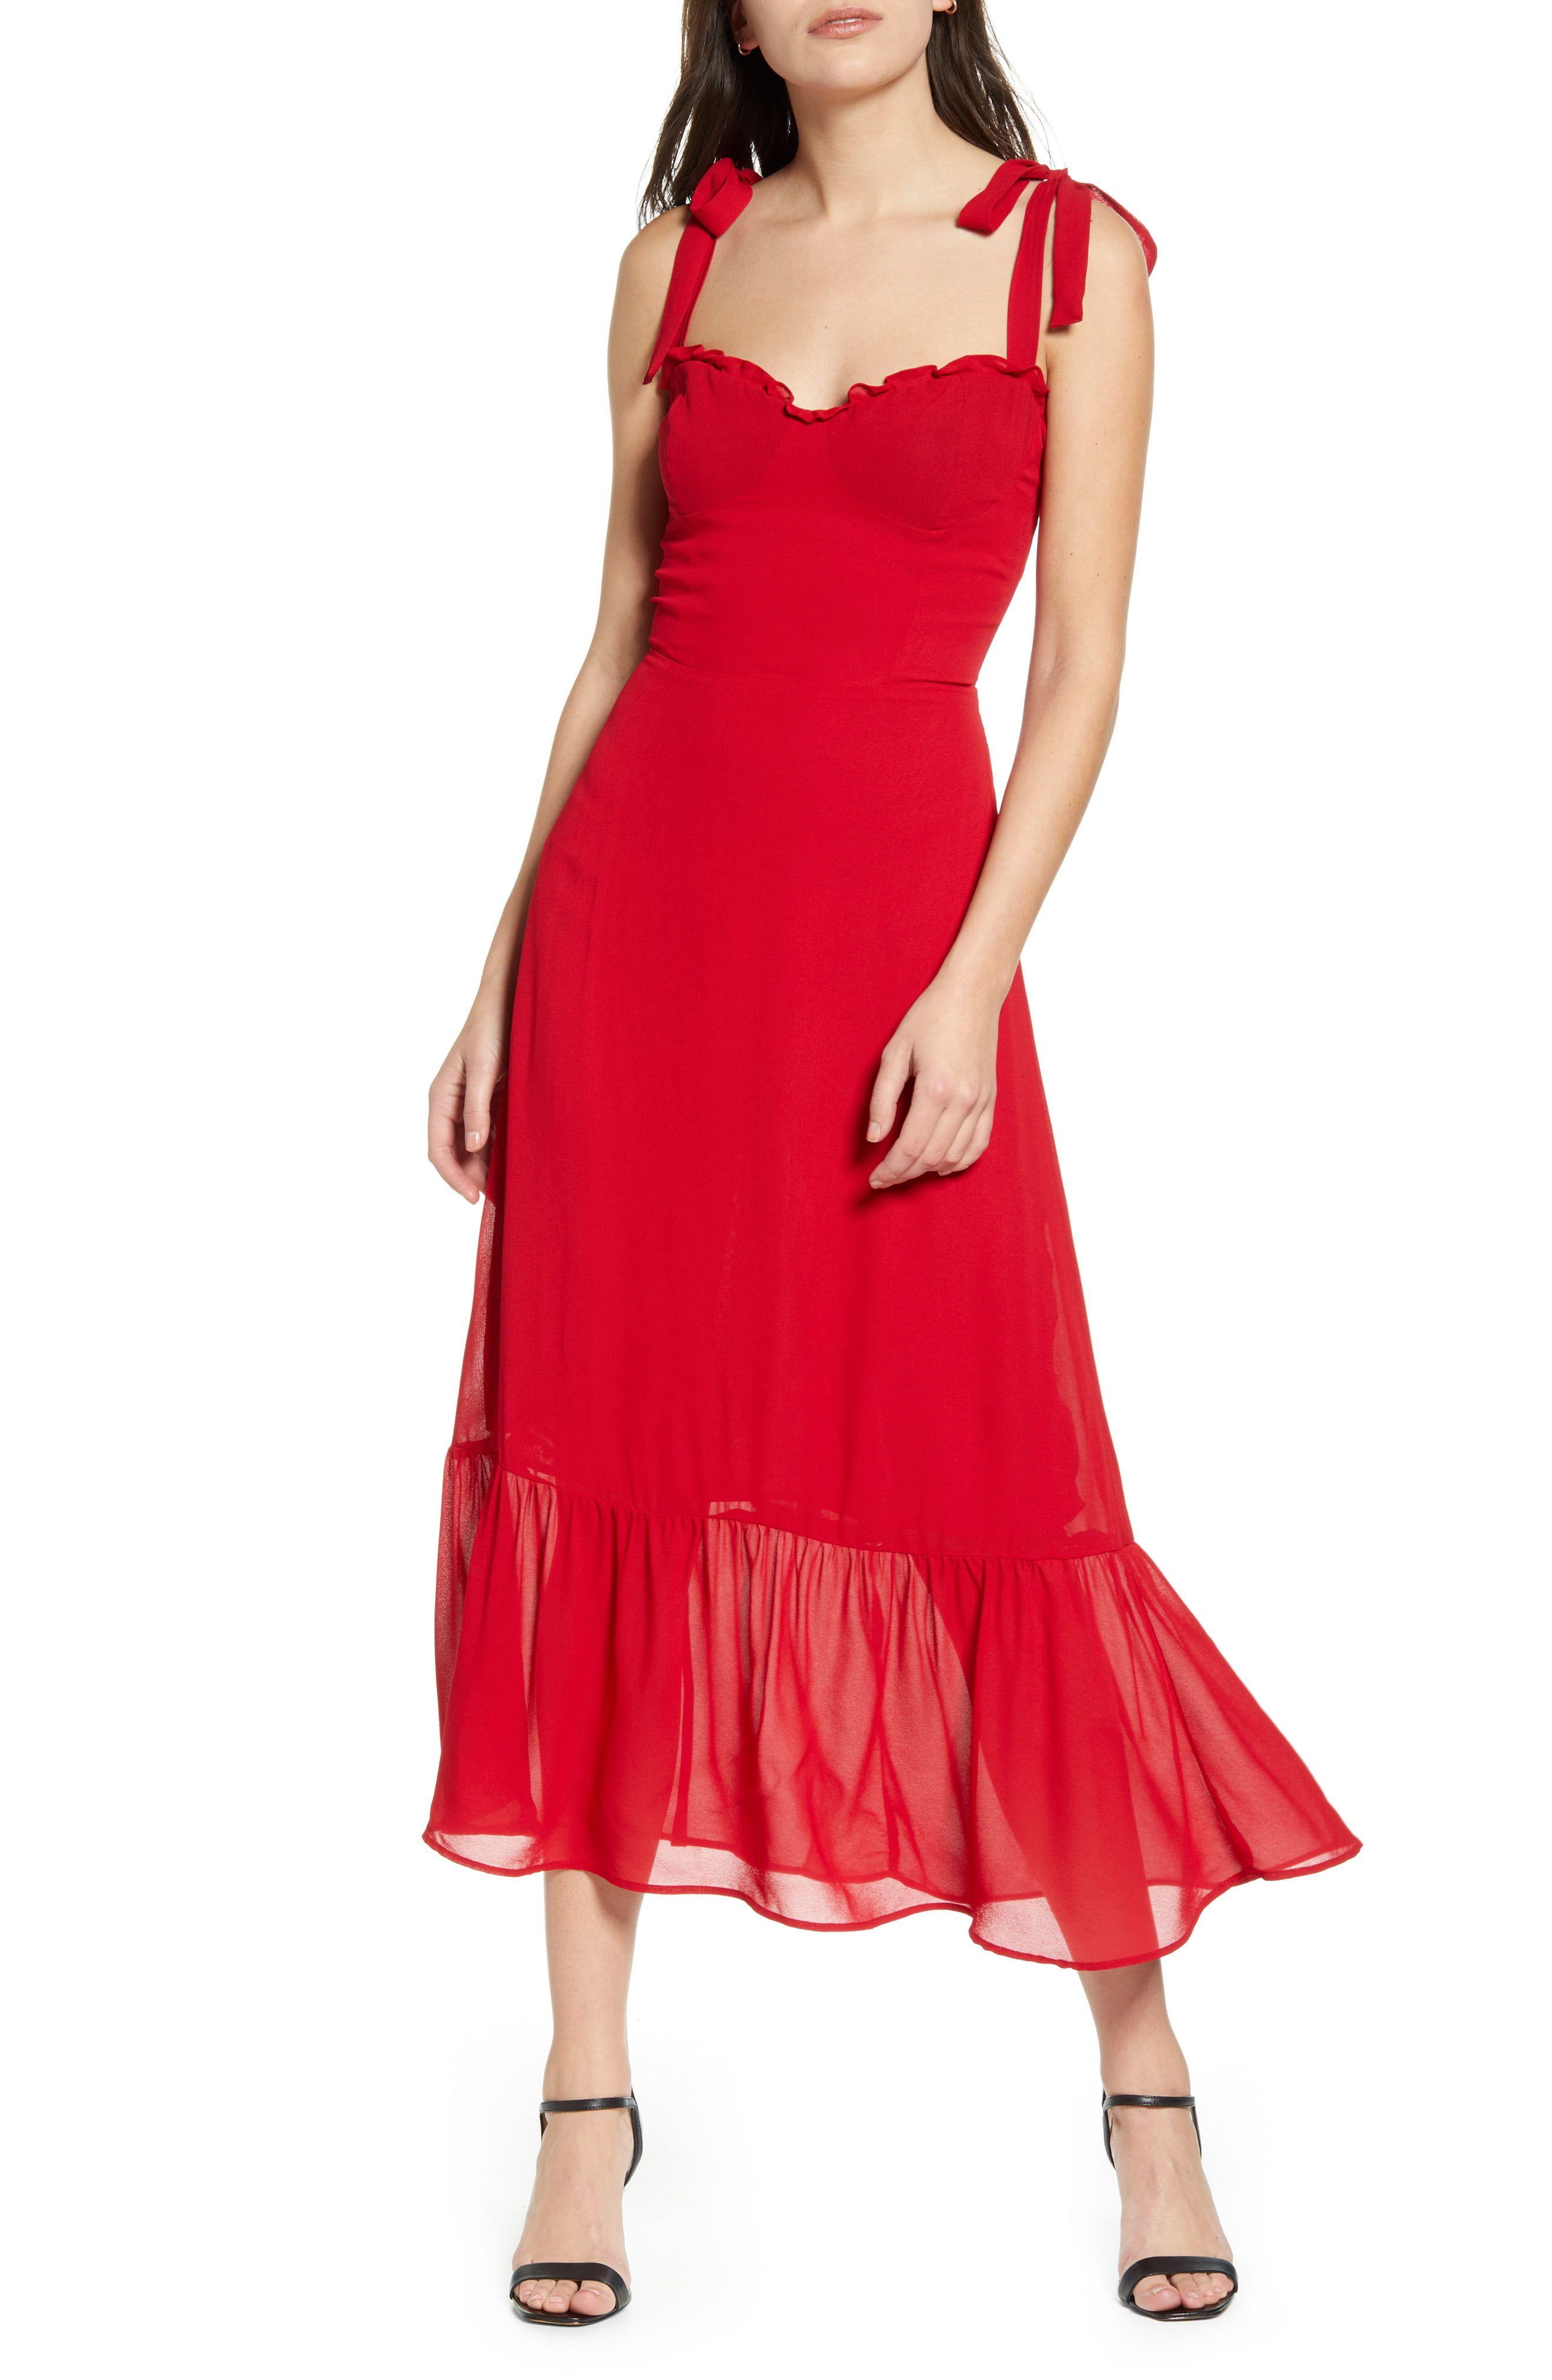 Reformation Nikita Midi Dress Nordstrom Dresses Reformation Dress Fashion Clothes Women [ 4048 x 2640 Pixel ]